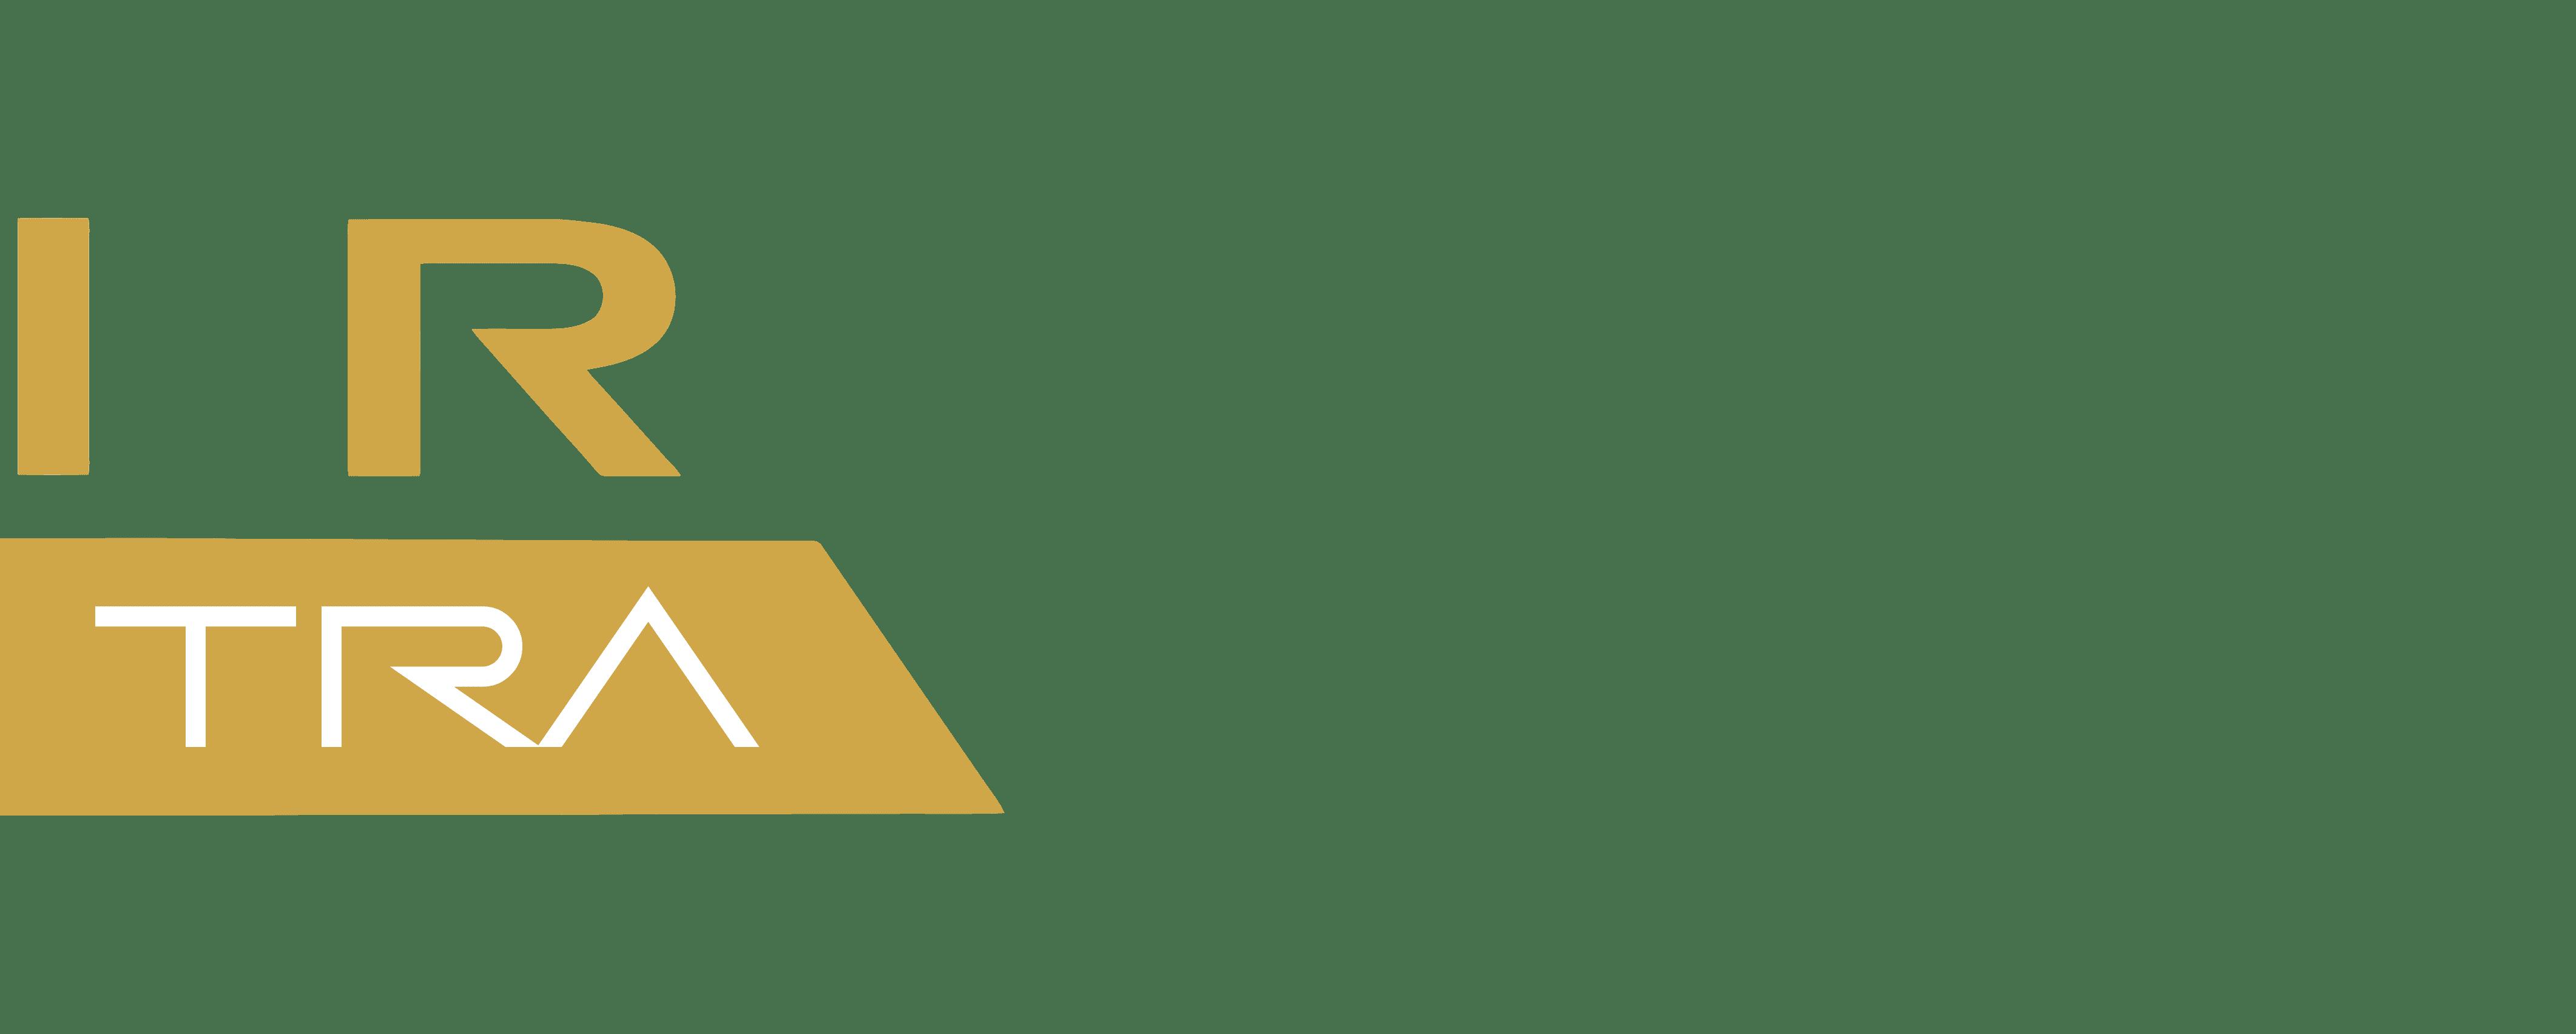 logo irantrawell